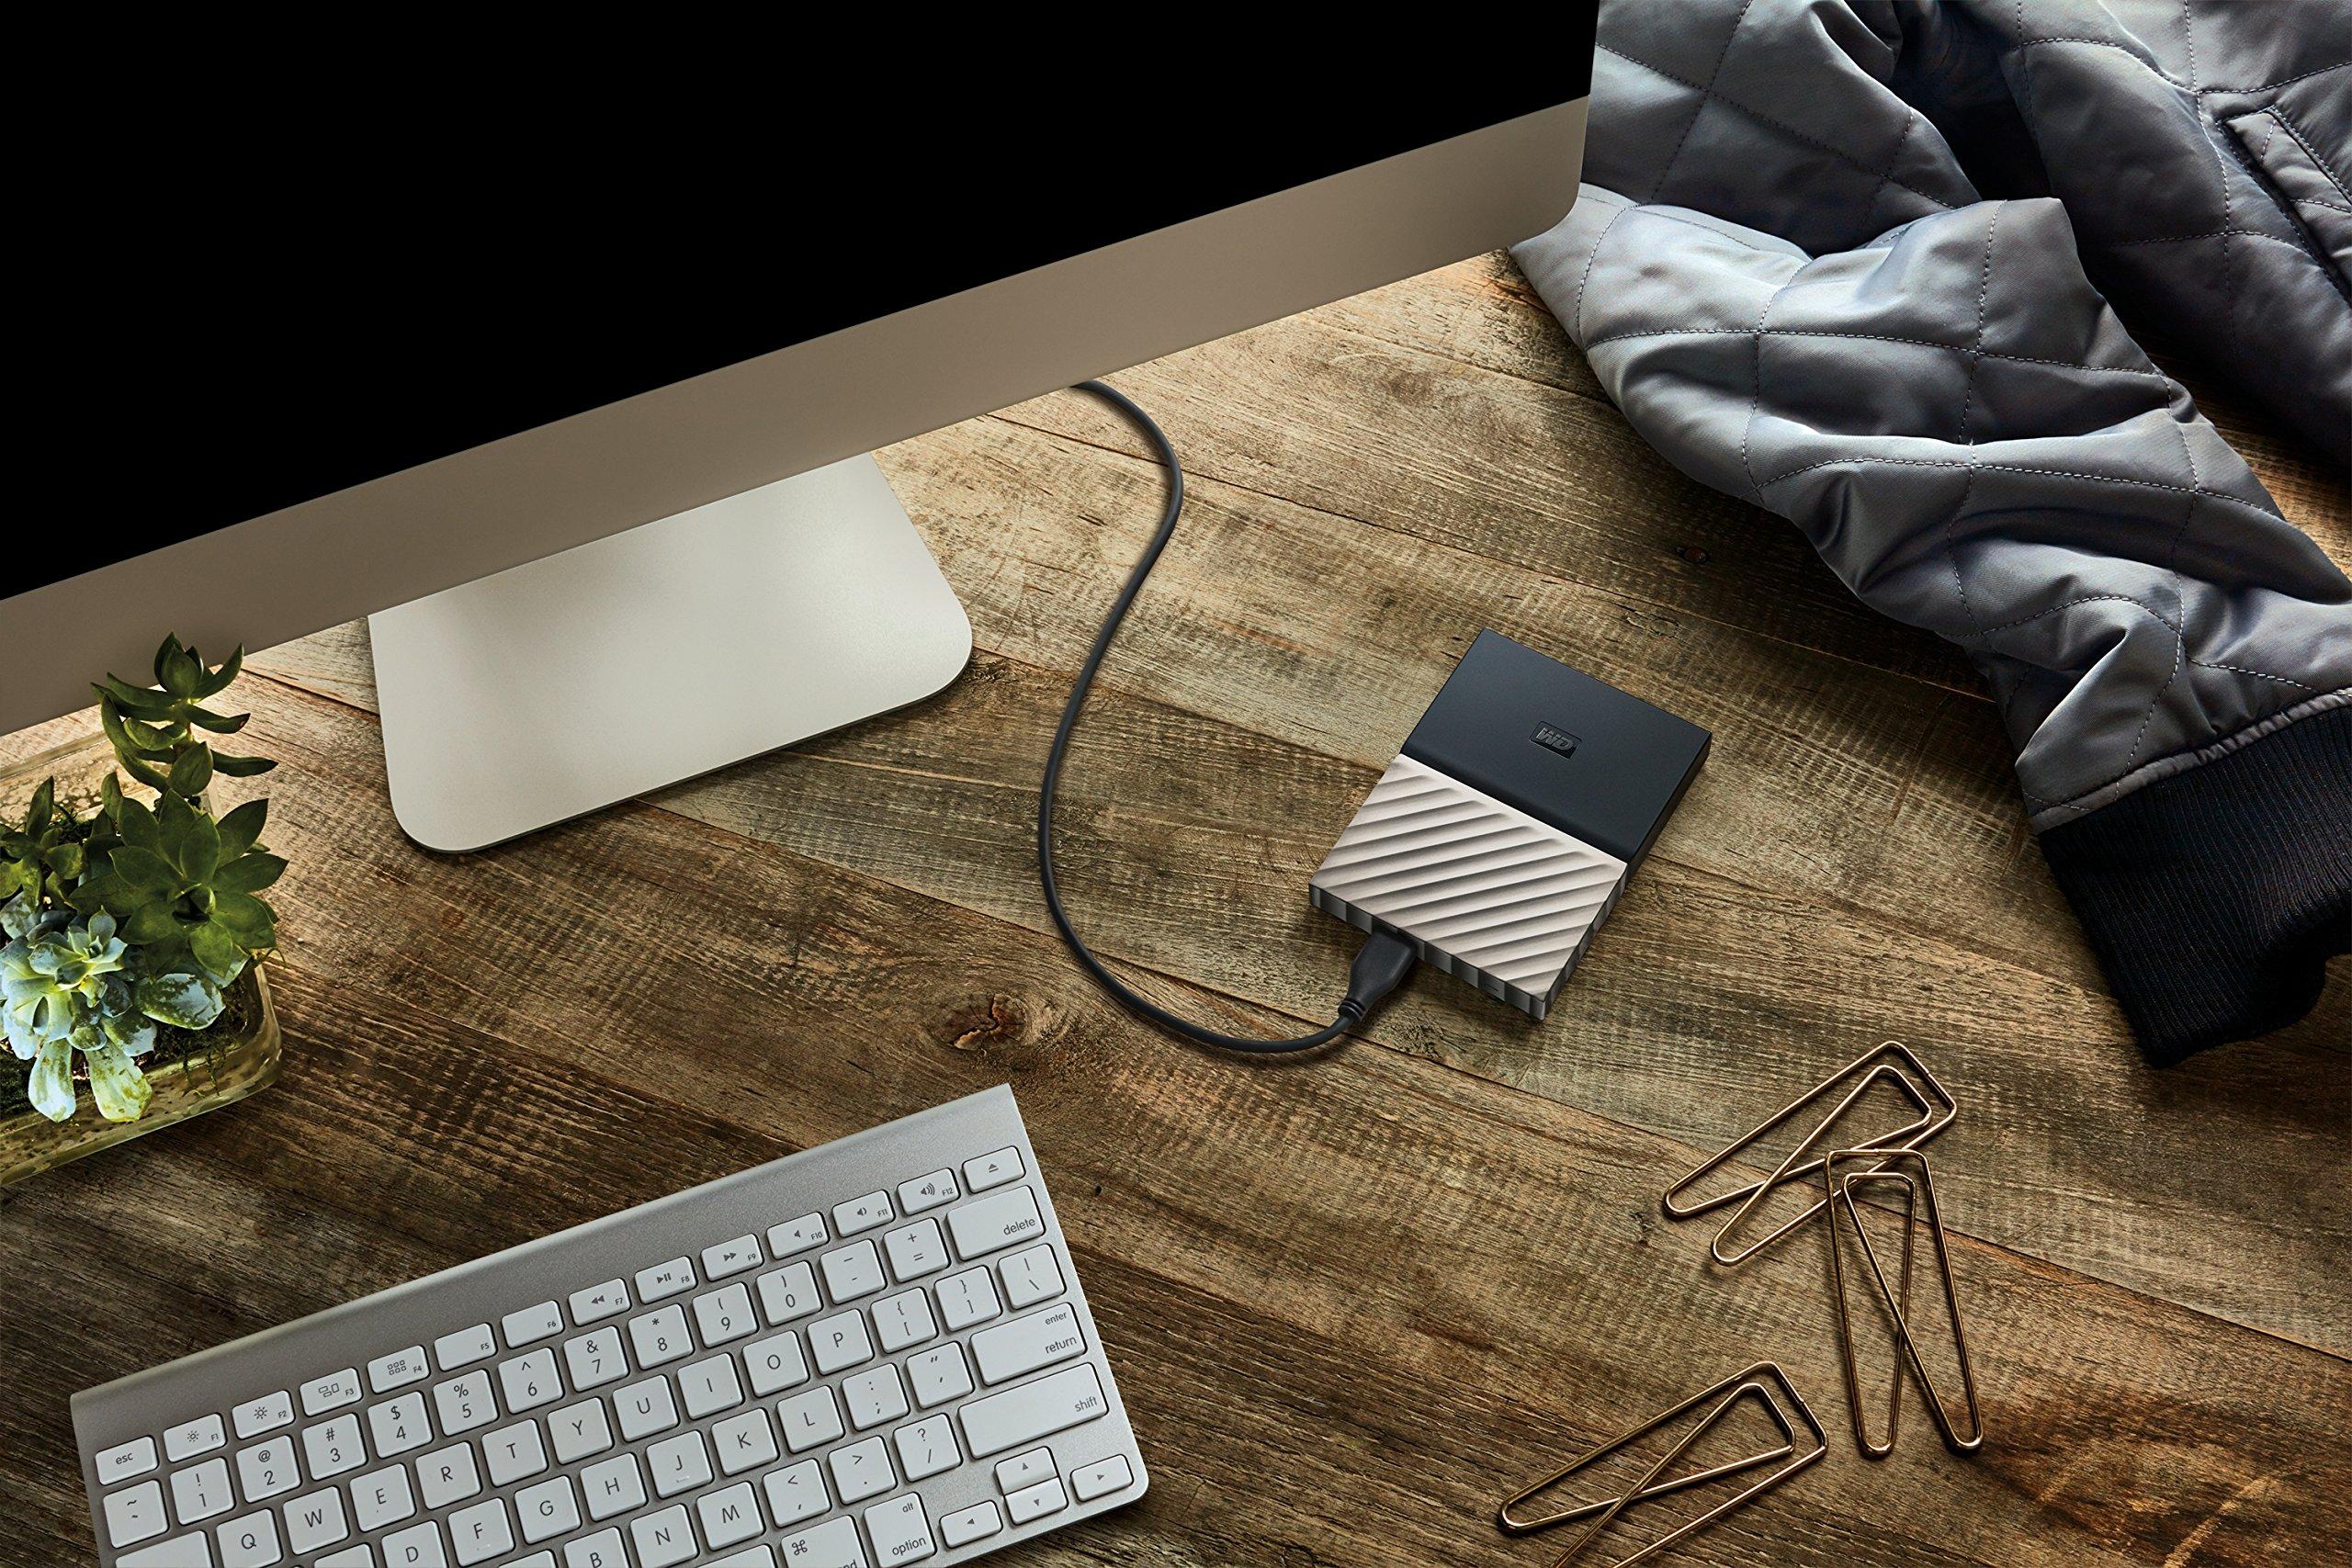 WD 1TB Black-Gray My Passport Ultra Portable External Hard Drive - USB 3.0 - WDBTLG0010BGY-WESN (Old Generation) by Western Digital (Image #6)